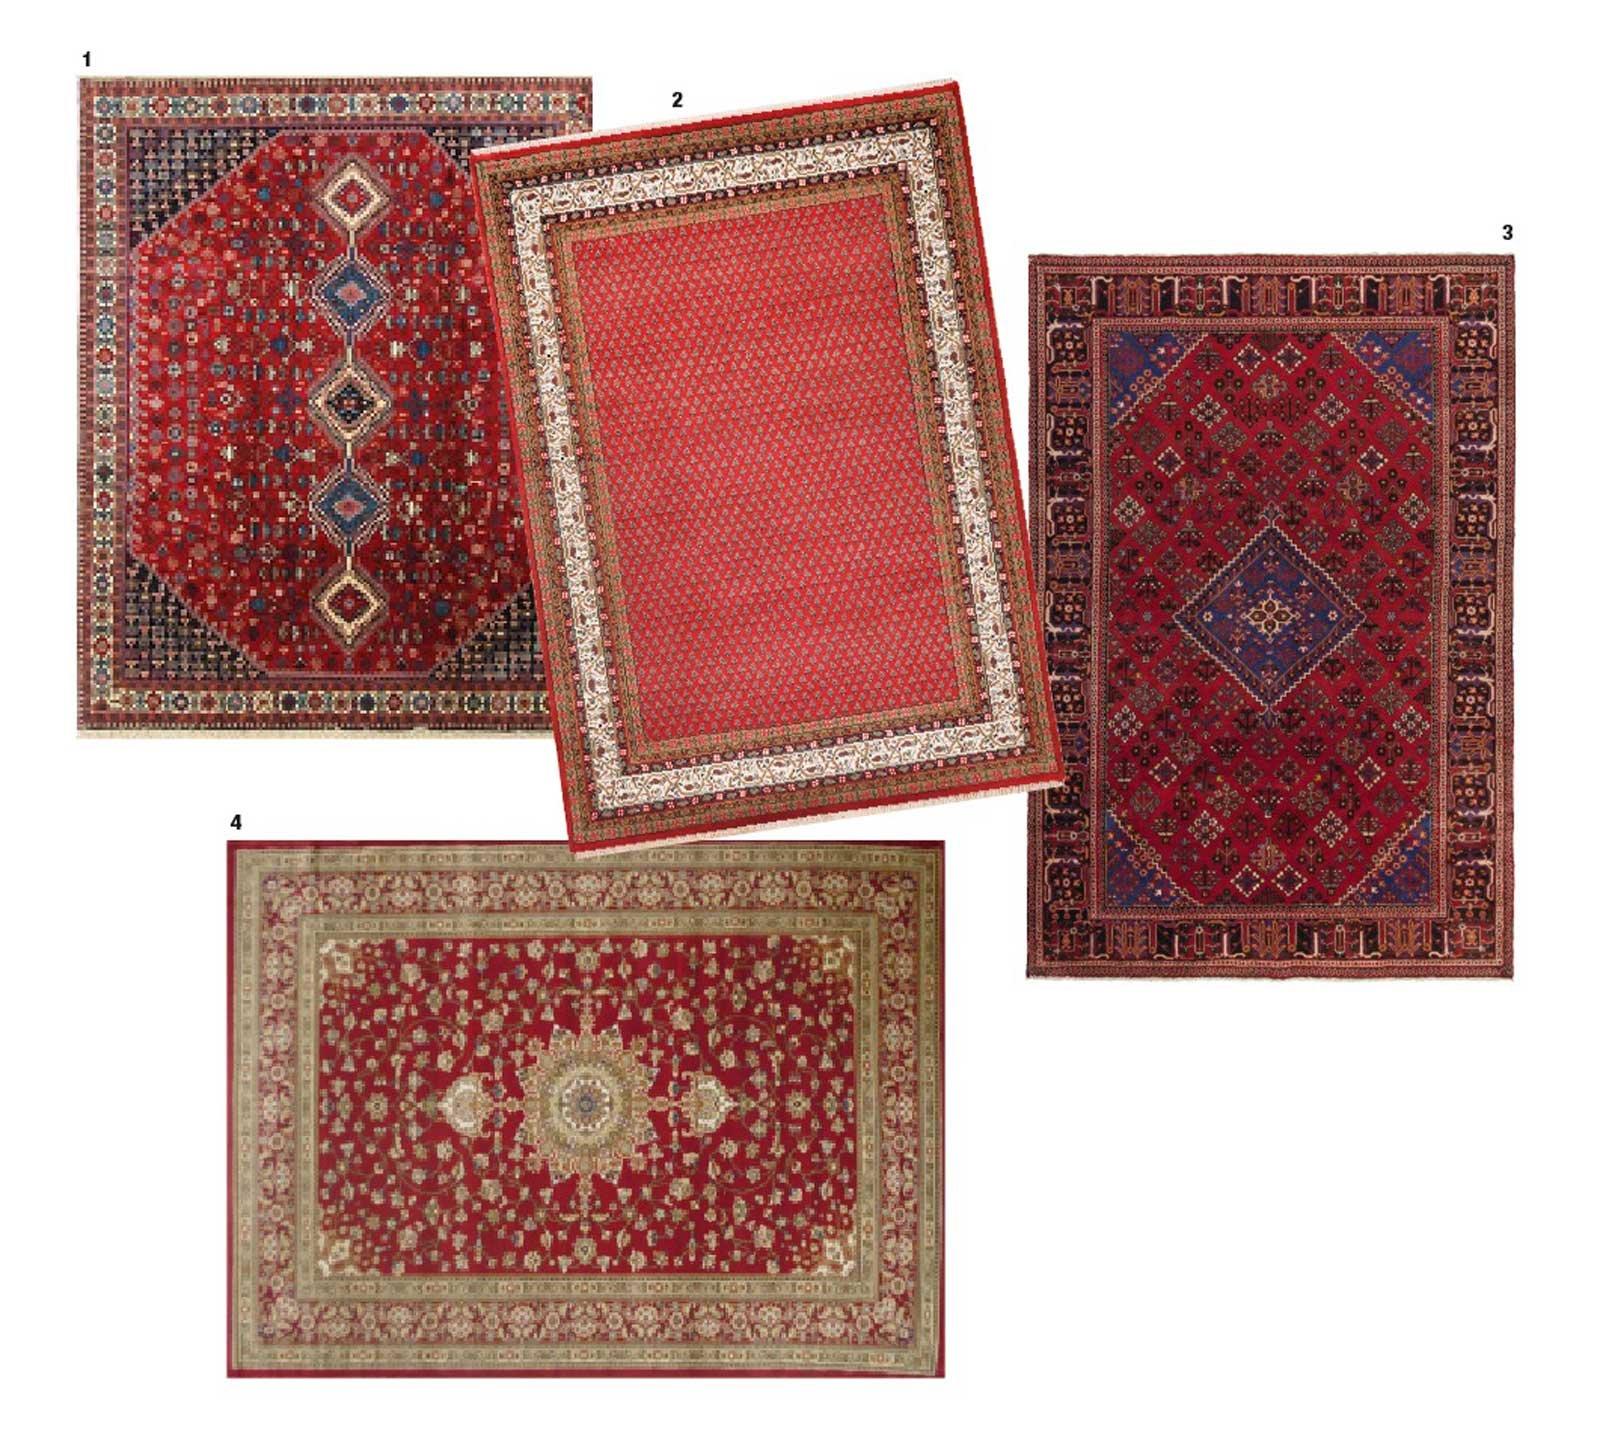 Ispirazione tappeti orientali - Tappeti orientali ...